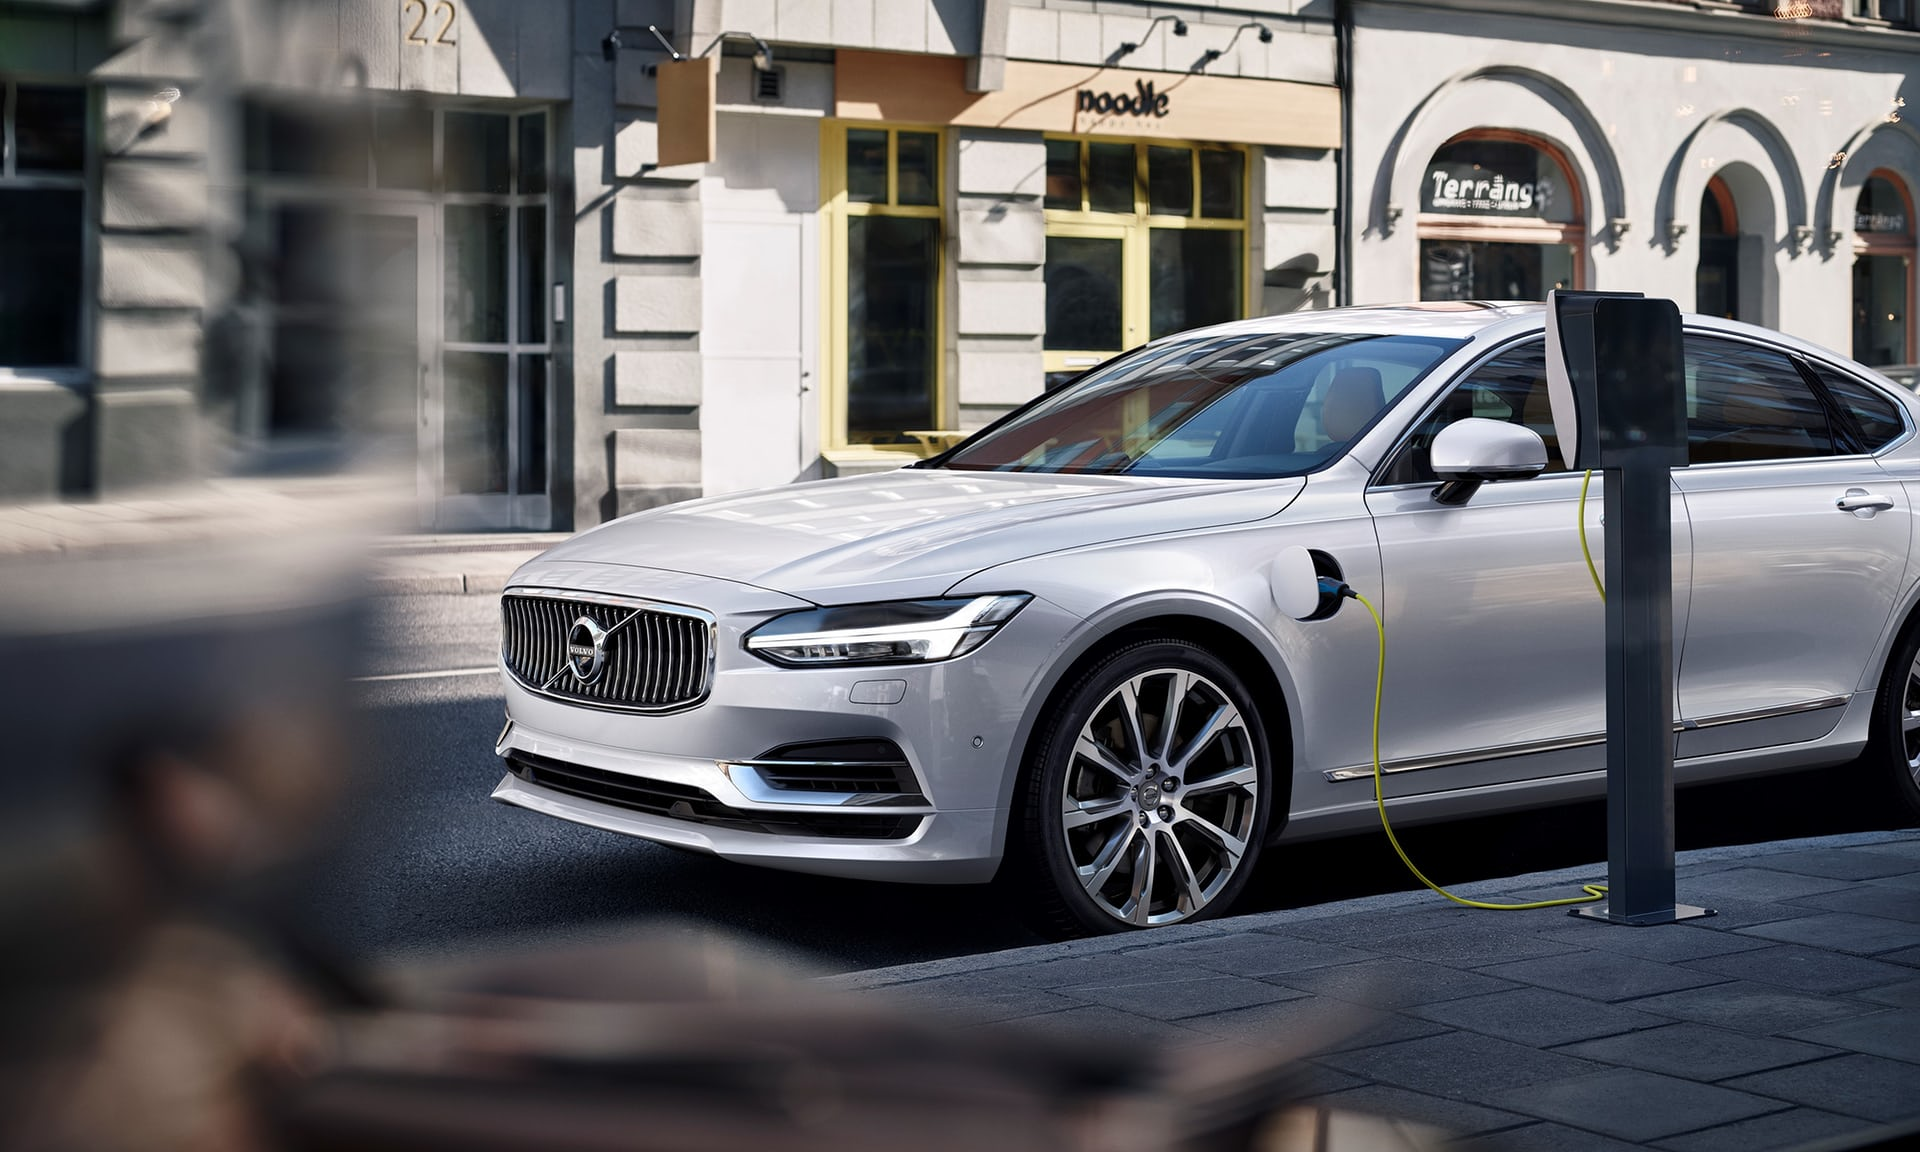 Volvo S90混合动力车在充电。图片来源/theguardian